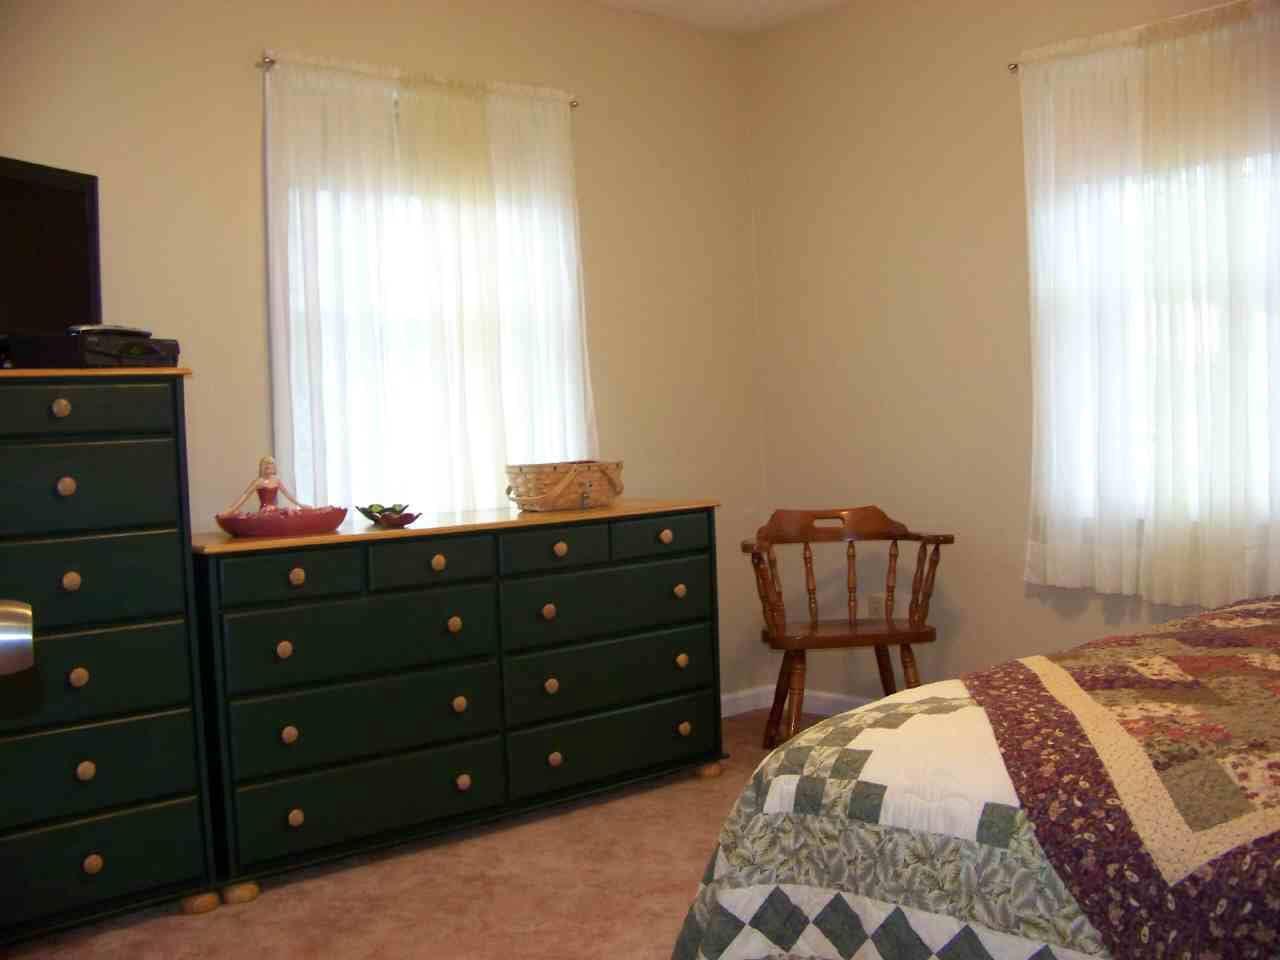 36 Wynnefield Drive, South Glens Falls NY 12803 photo 8